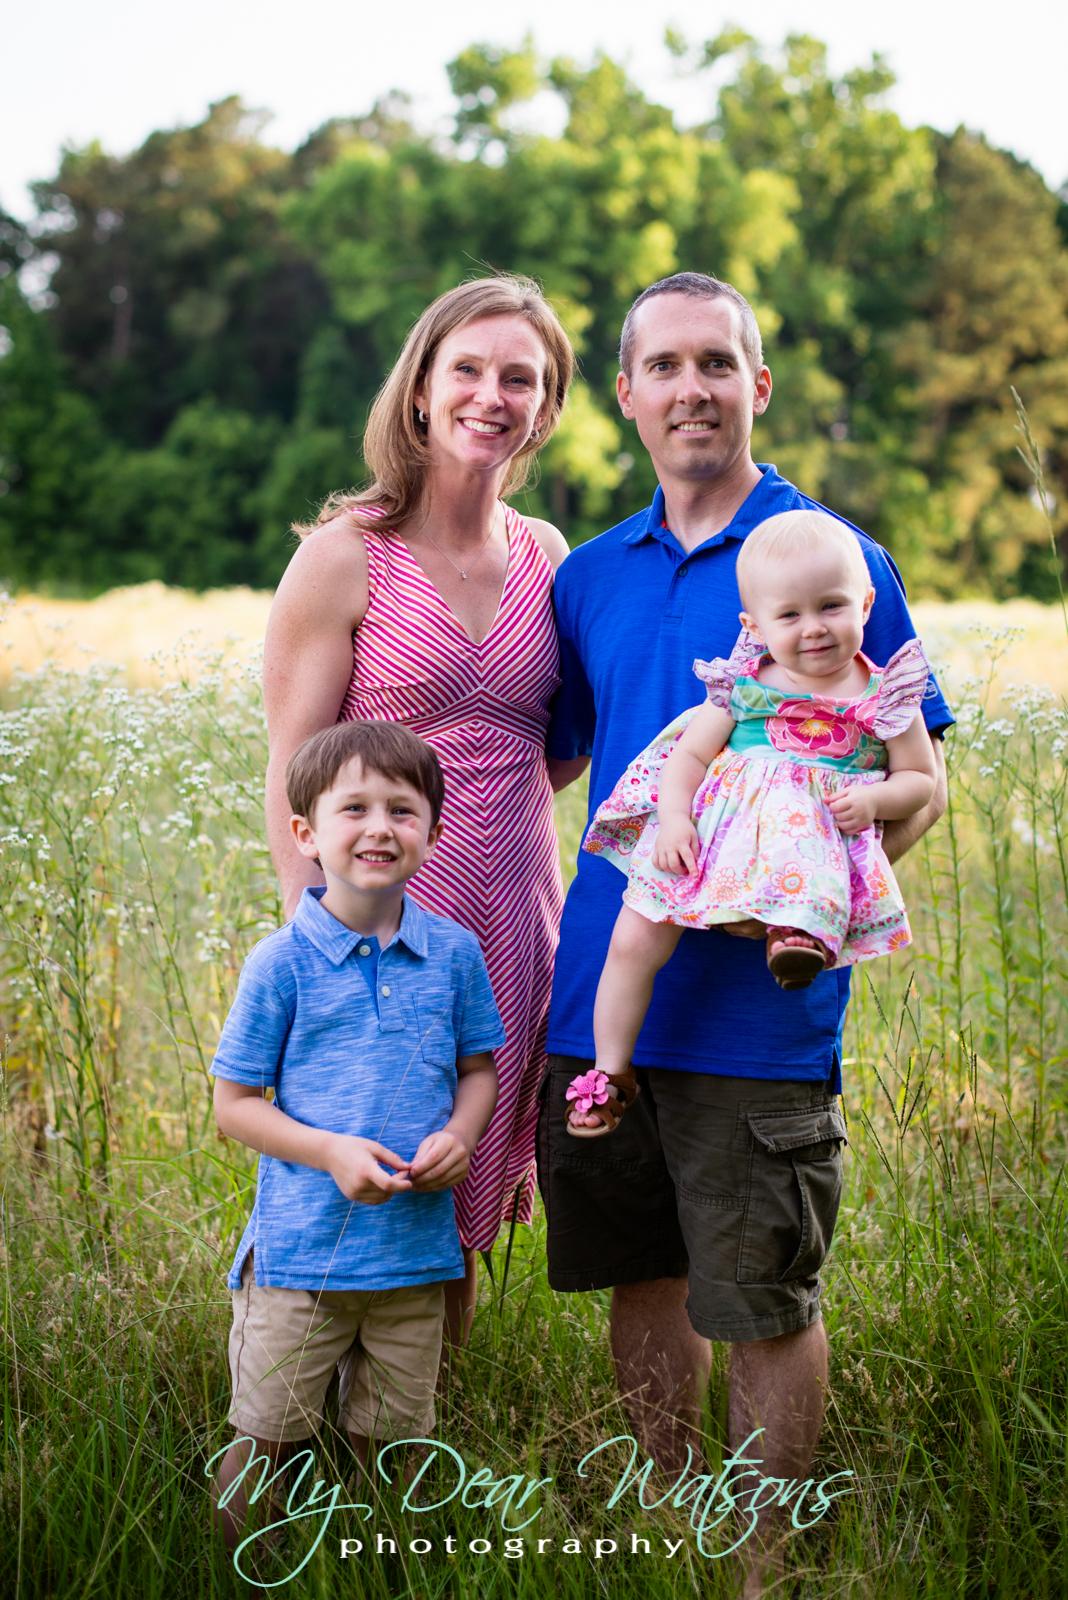 MDW Family-6.jpg